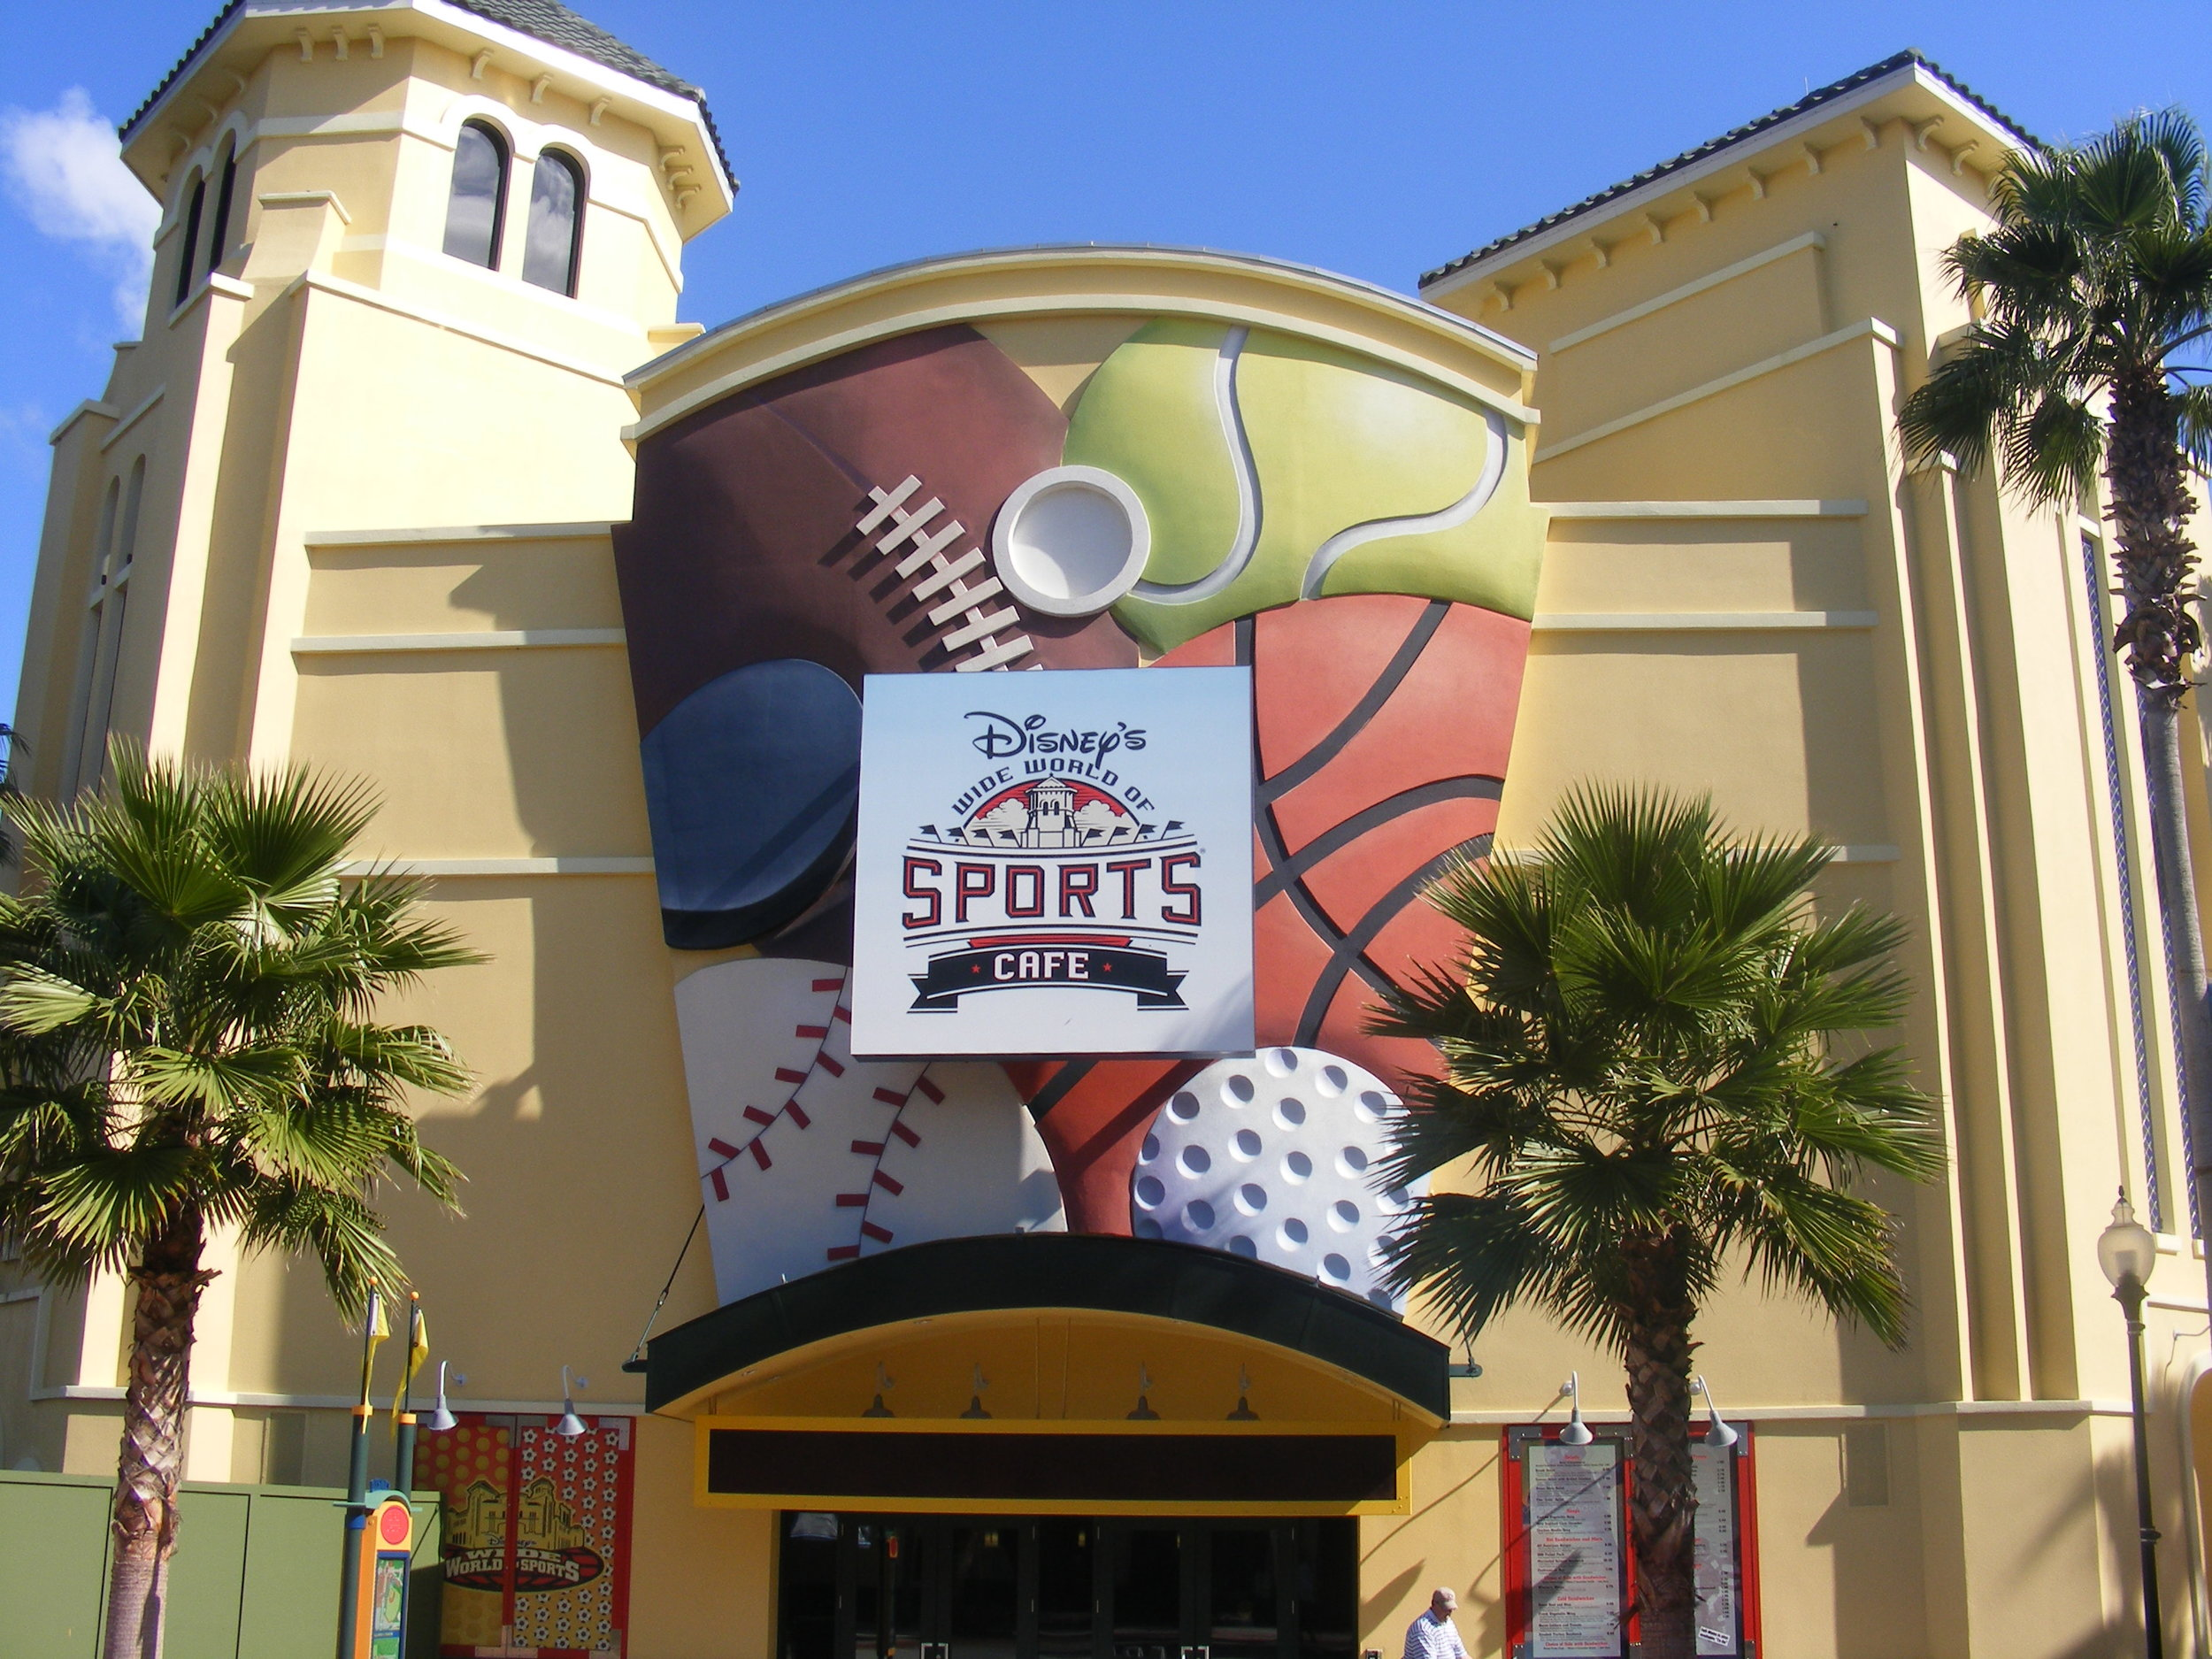 Entrance, Disney's Wide World of Sports Cafe